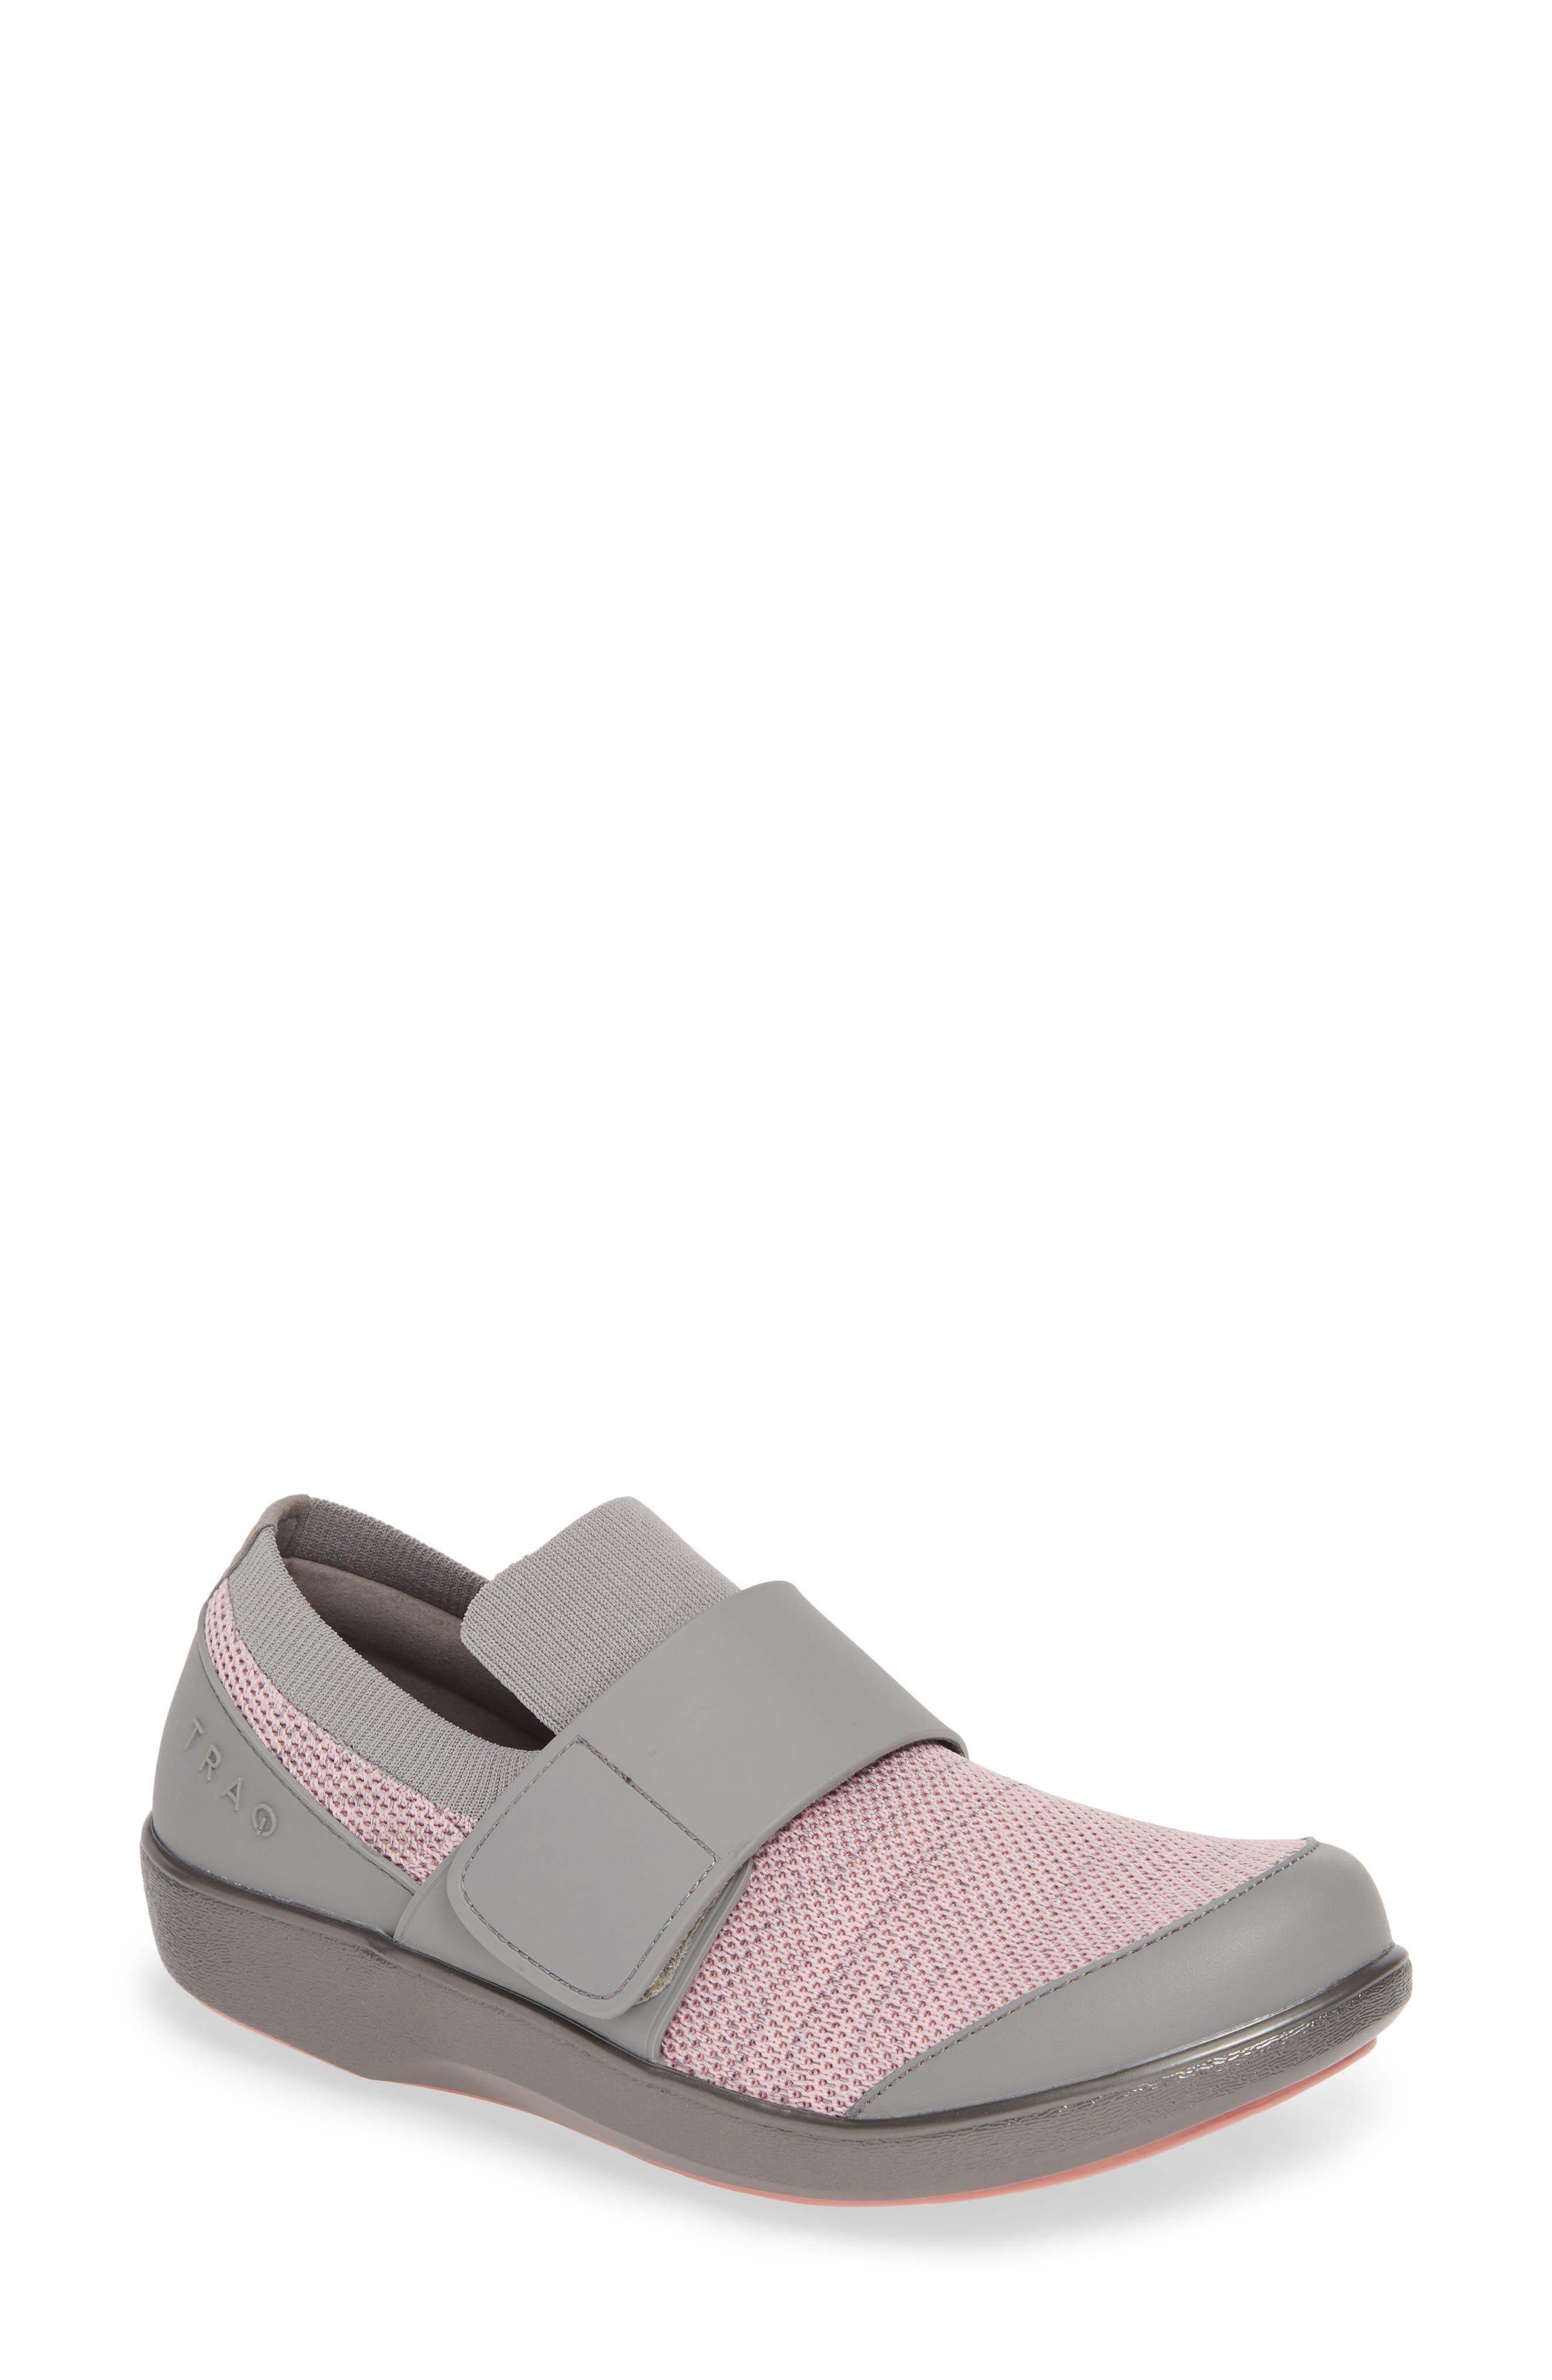 Alegria Qwik Sneaker, Pink